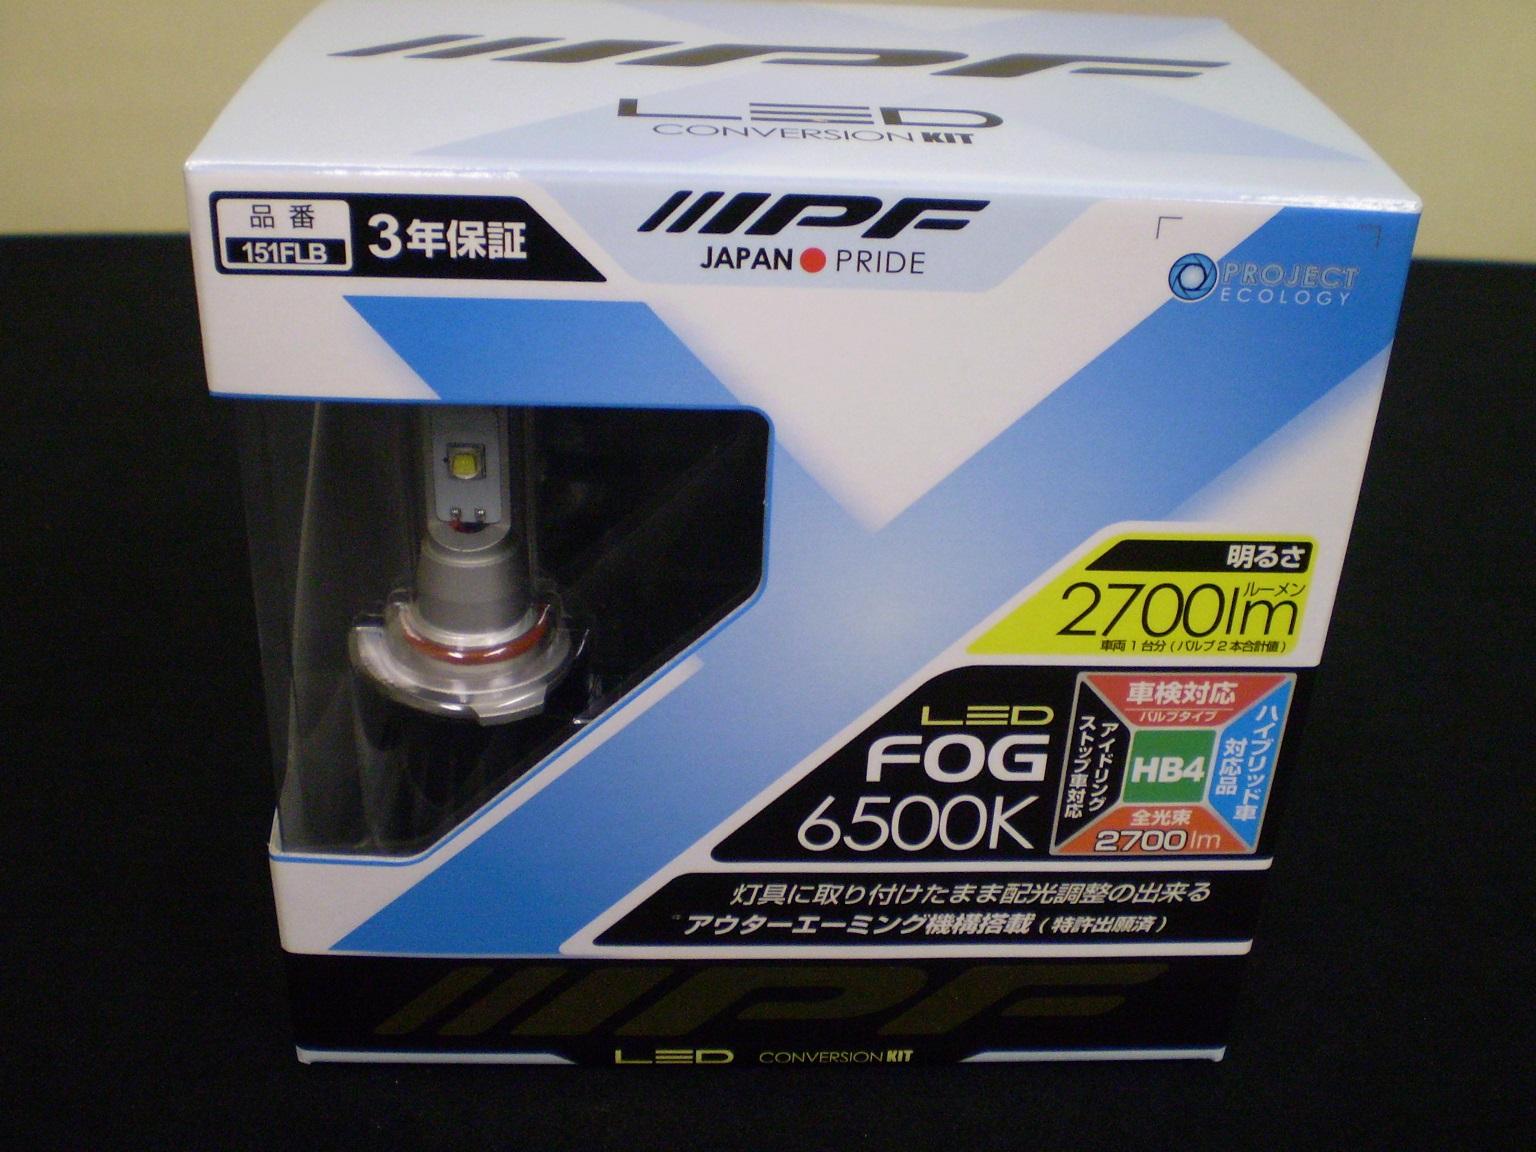 IPF LED フォグ ライト 6500K HB4 151FLB 2700ルーメン 車検対応 3年保証 led フォグ ライト【 02P05Nov16 】